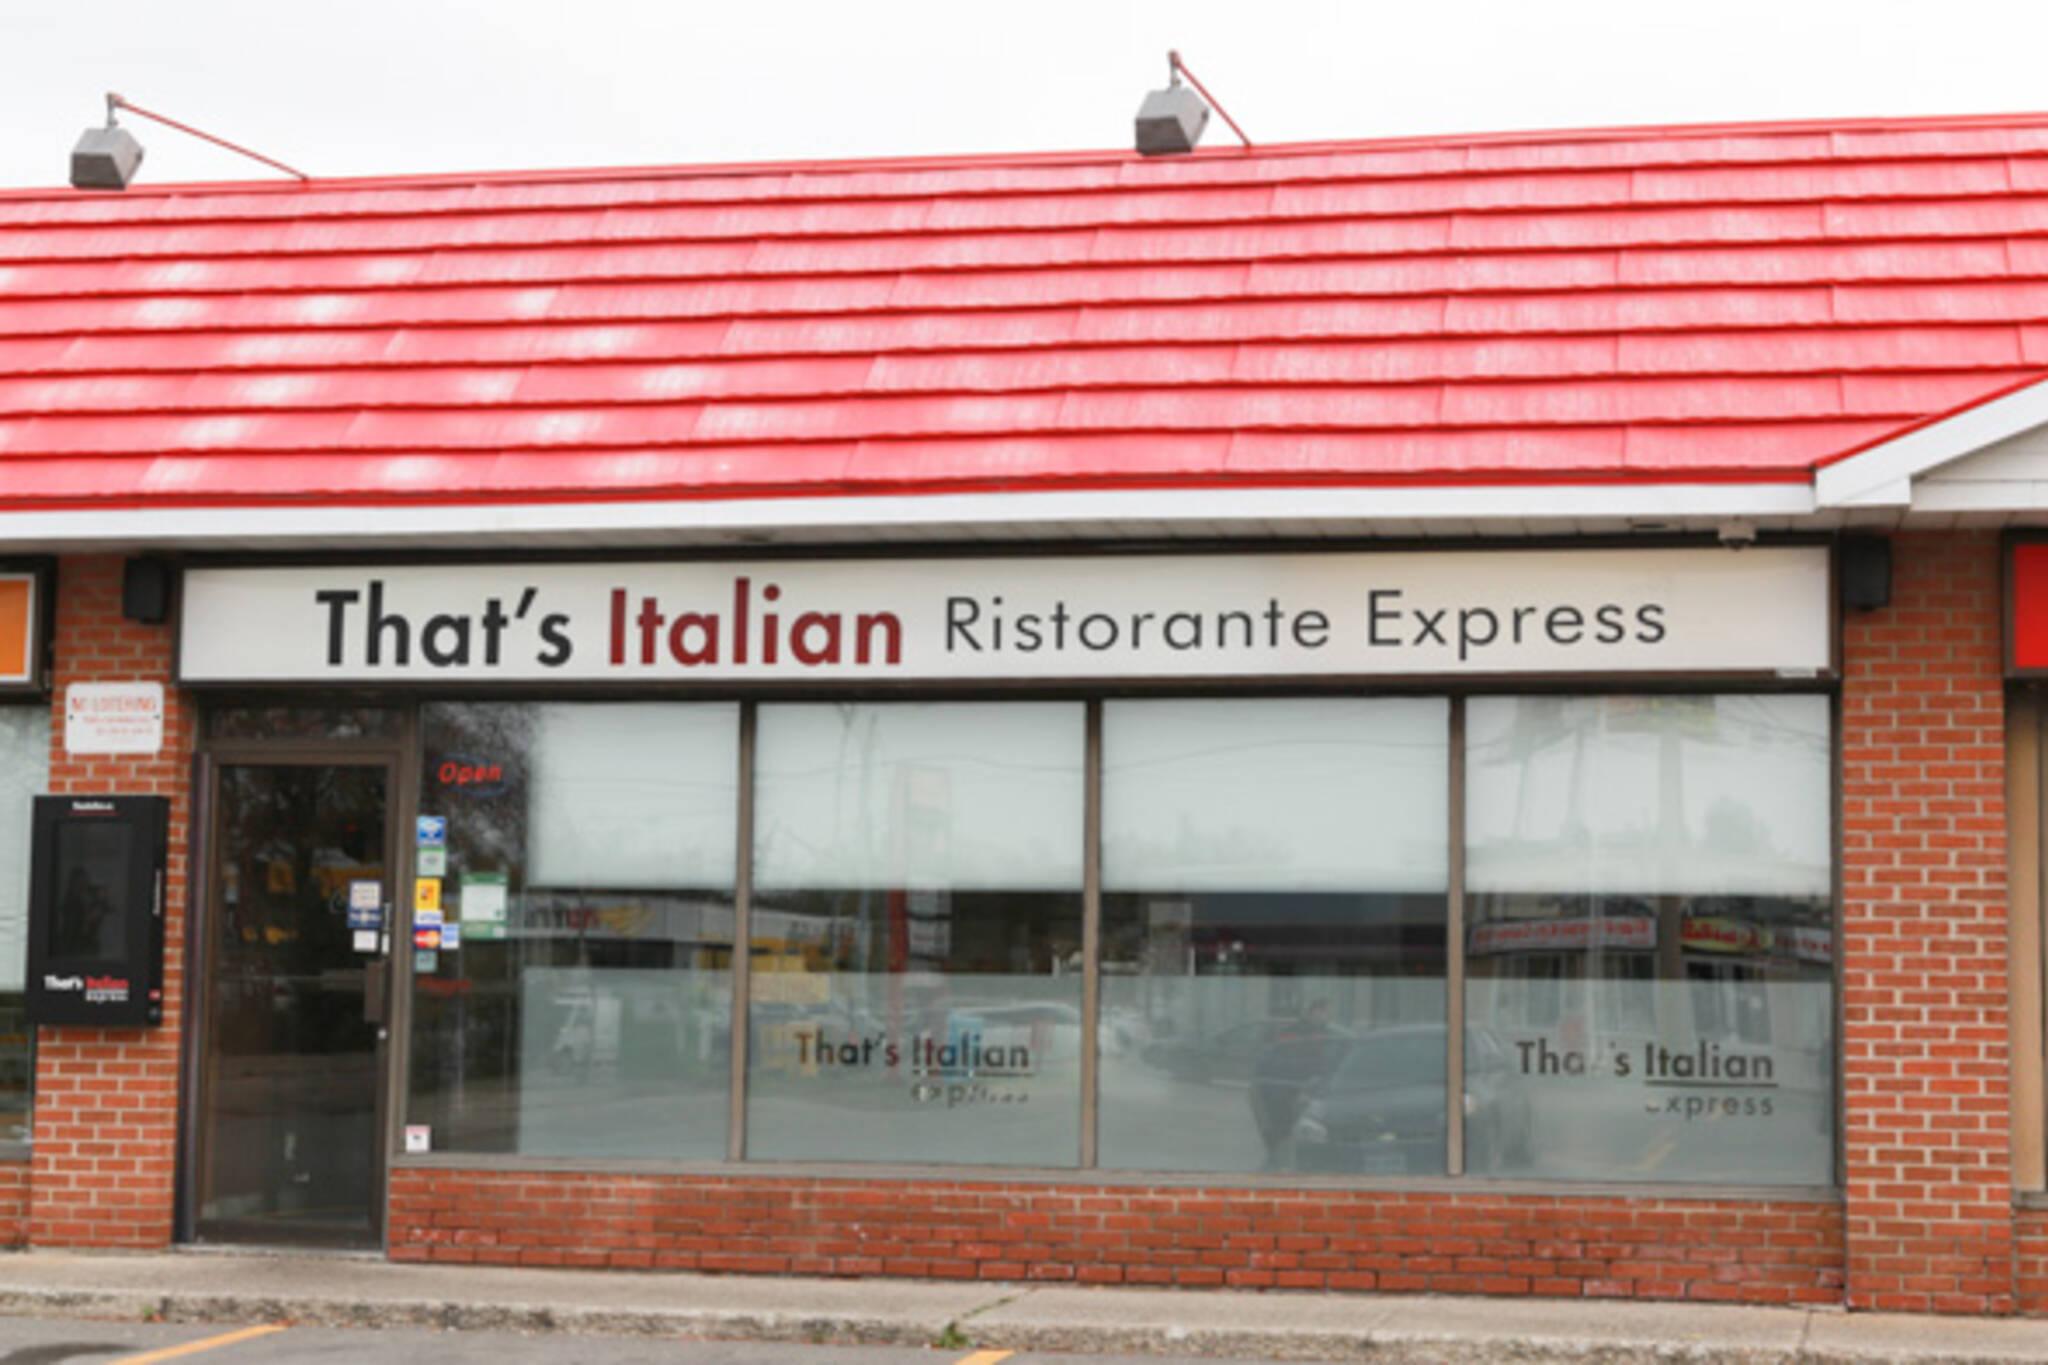 thats italian ristorante express